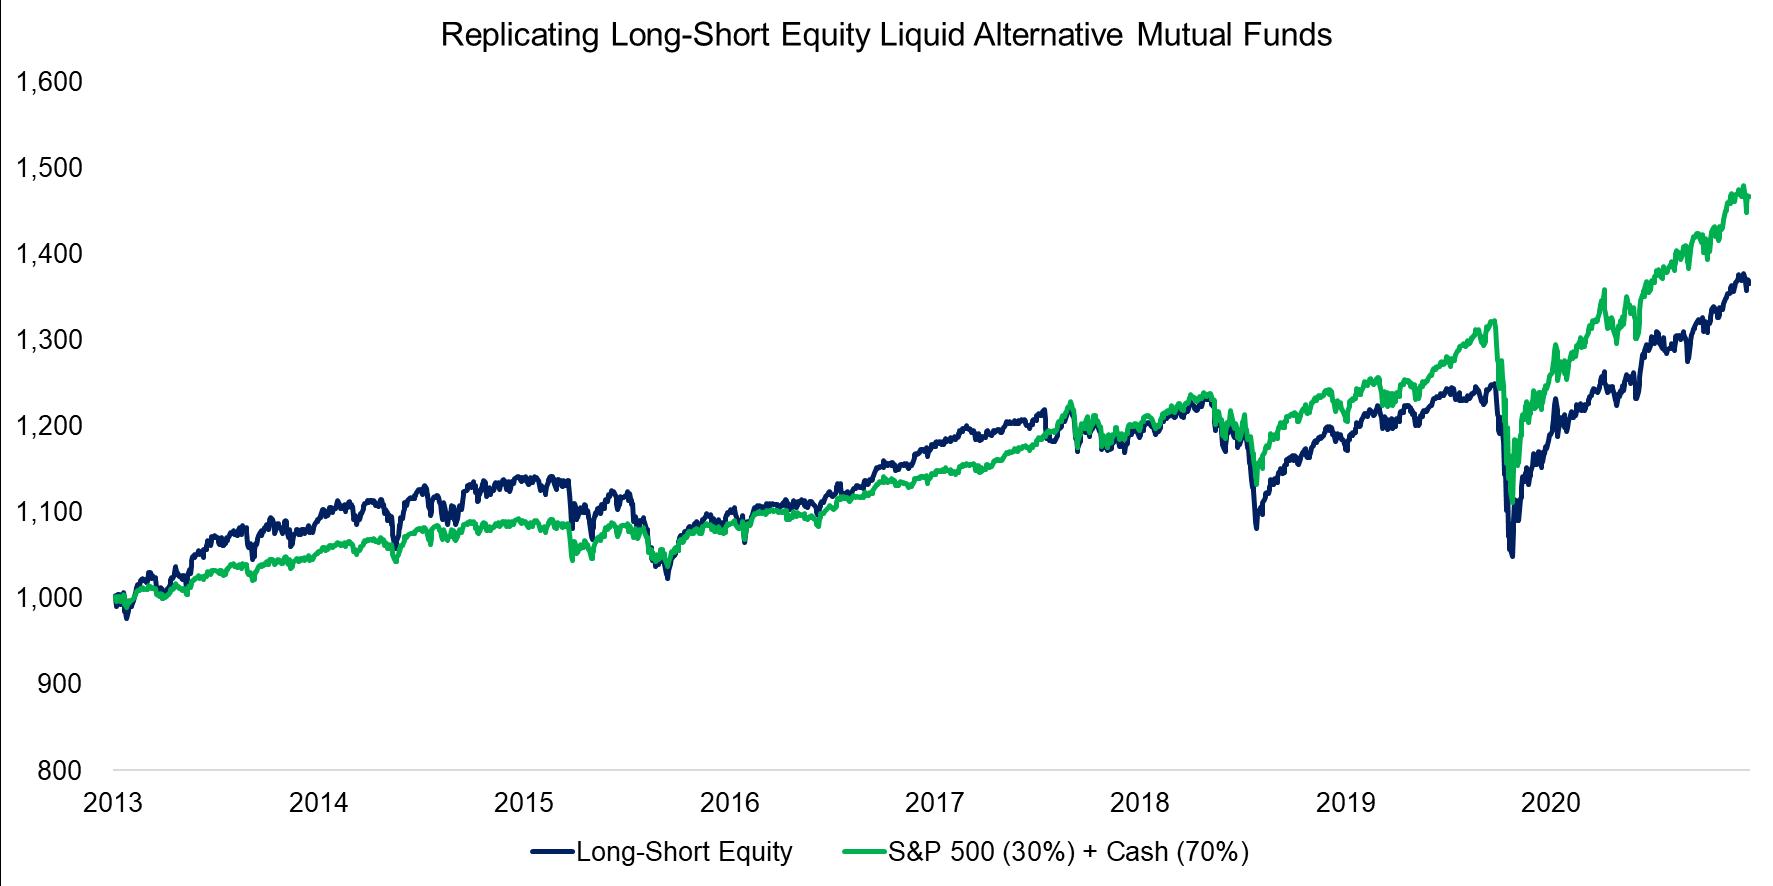 Replicating Long-Short Equity Liquid Alternative Mutual Funds